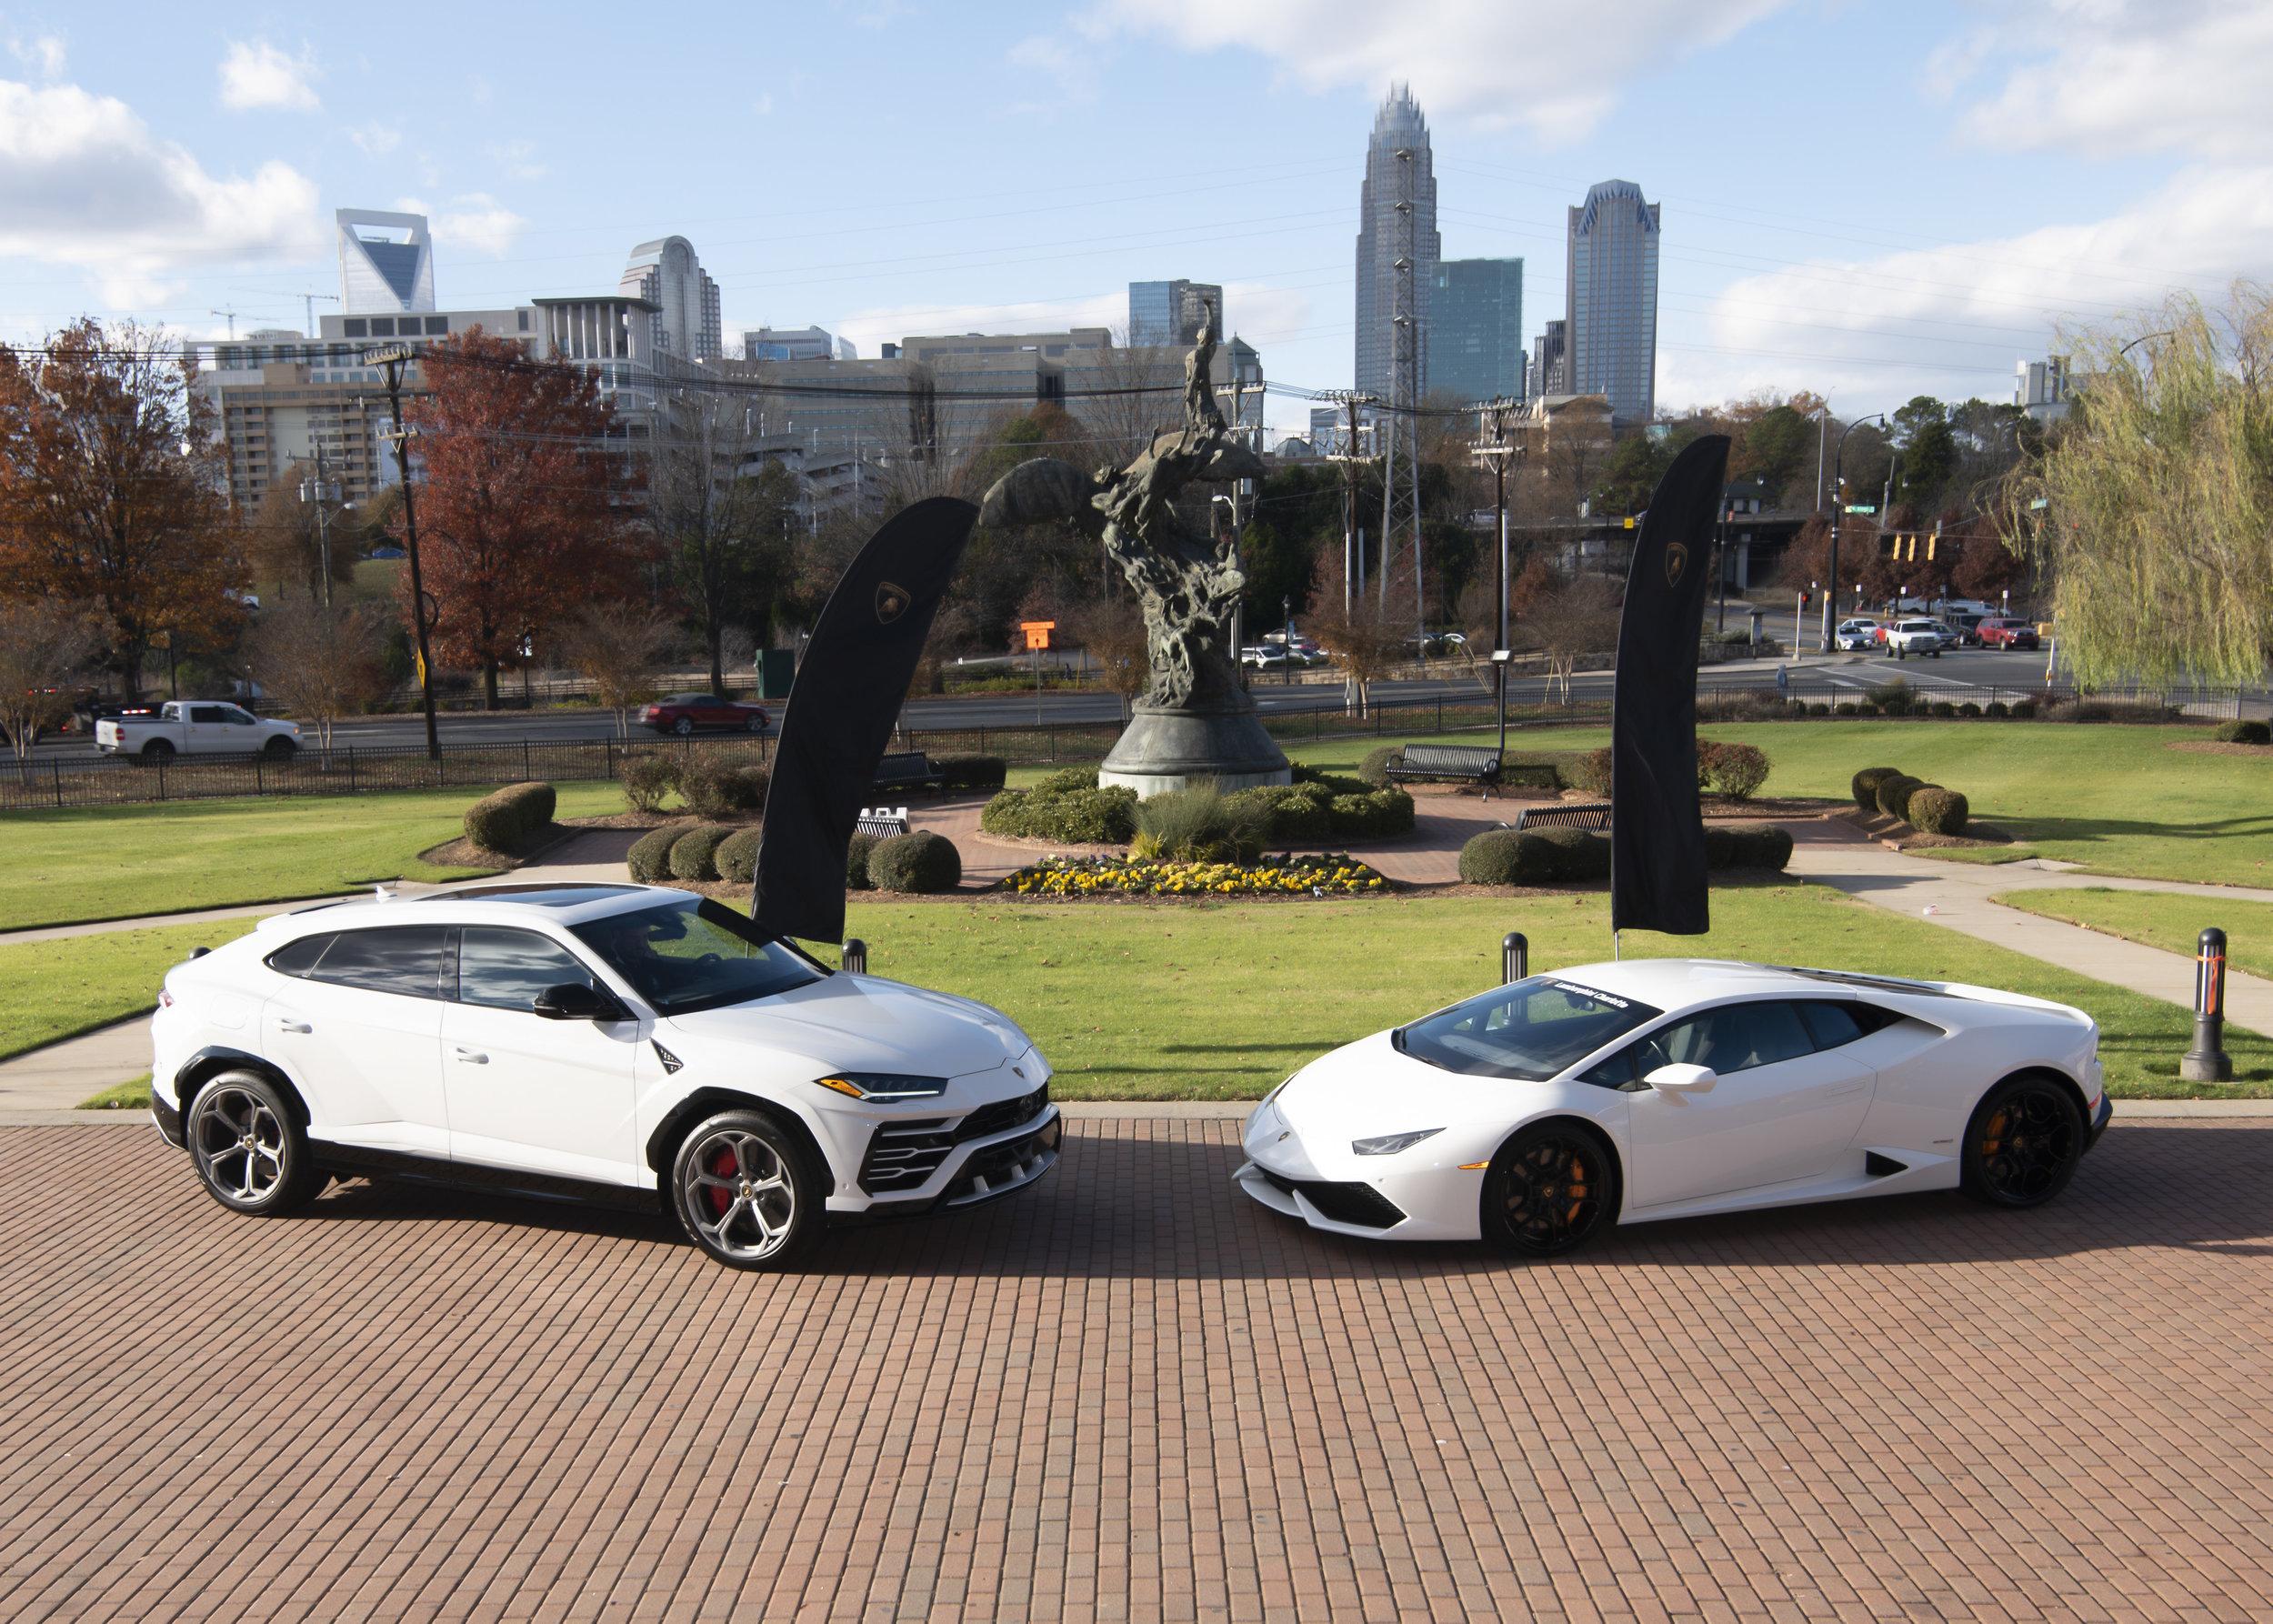 Lamborghini Urus and Lamborghini Huracán courtesy of Lamborghini Charlotte